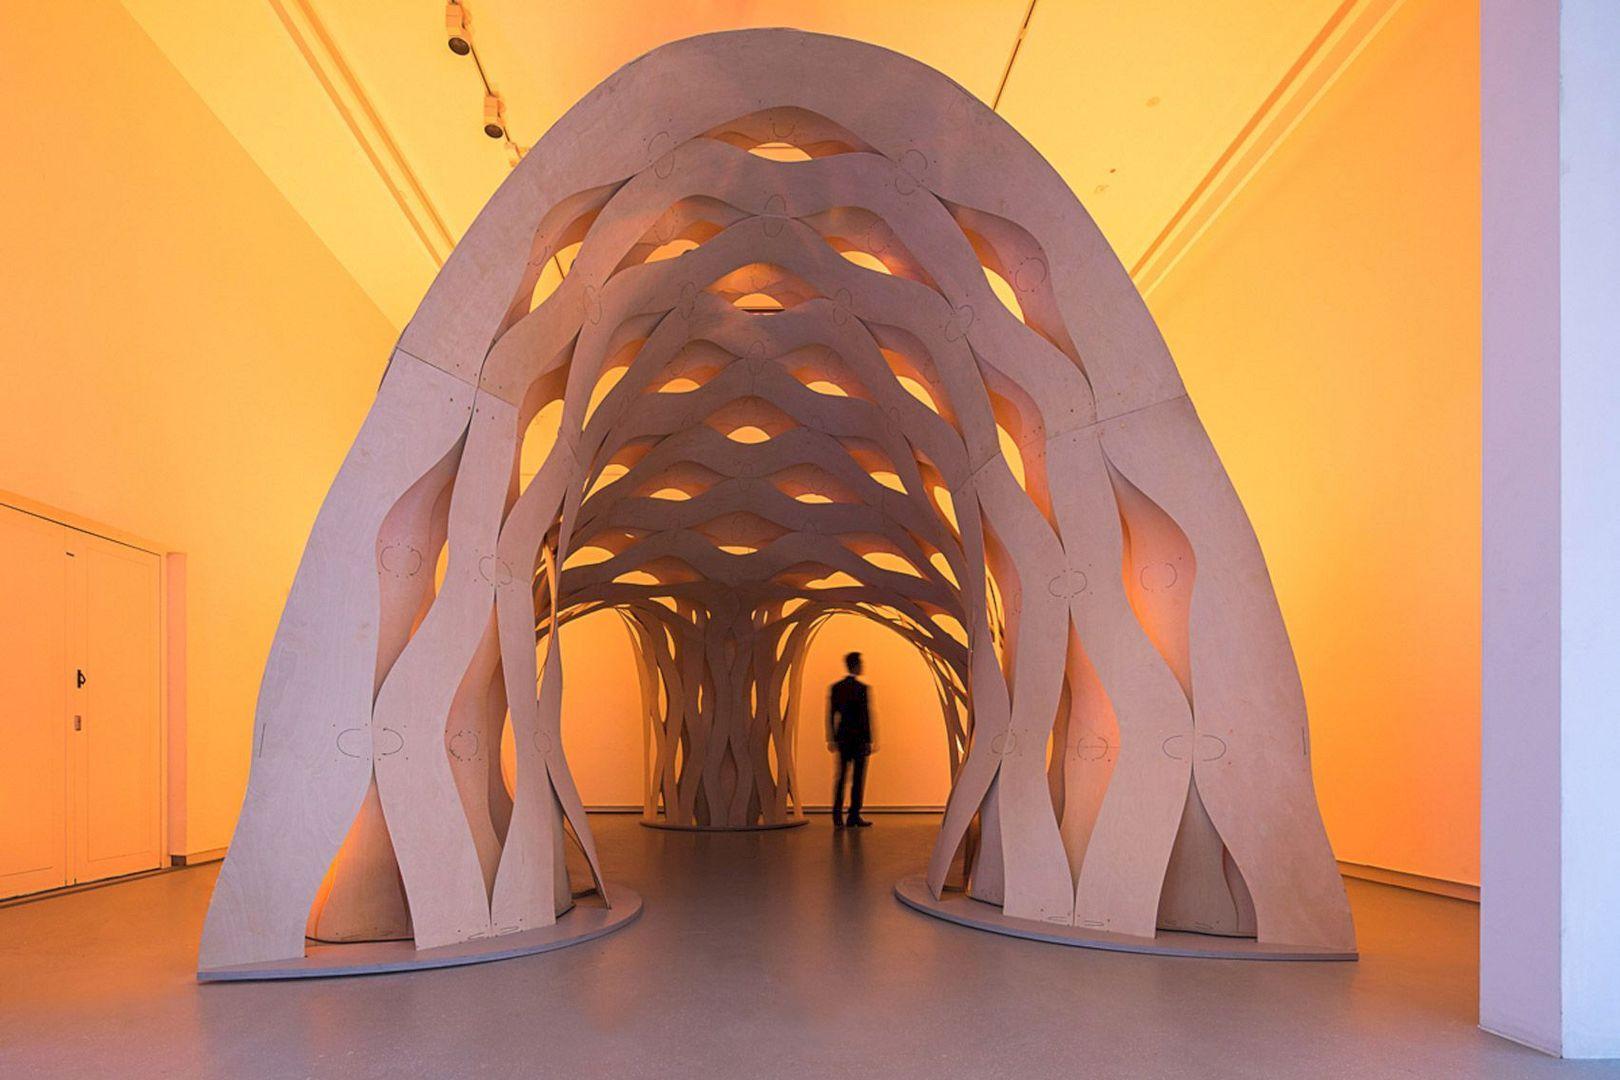 Design Society Shenzhen: The Main Exhibition Hall Showcasing